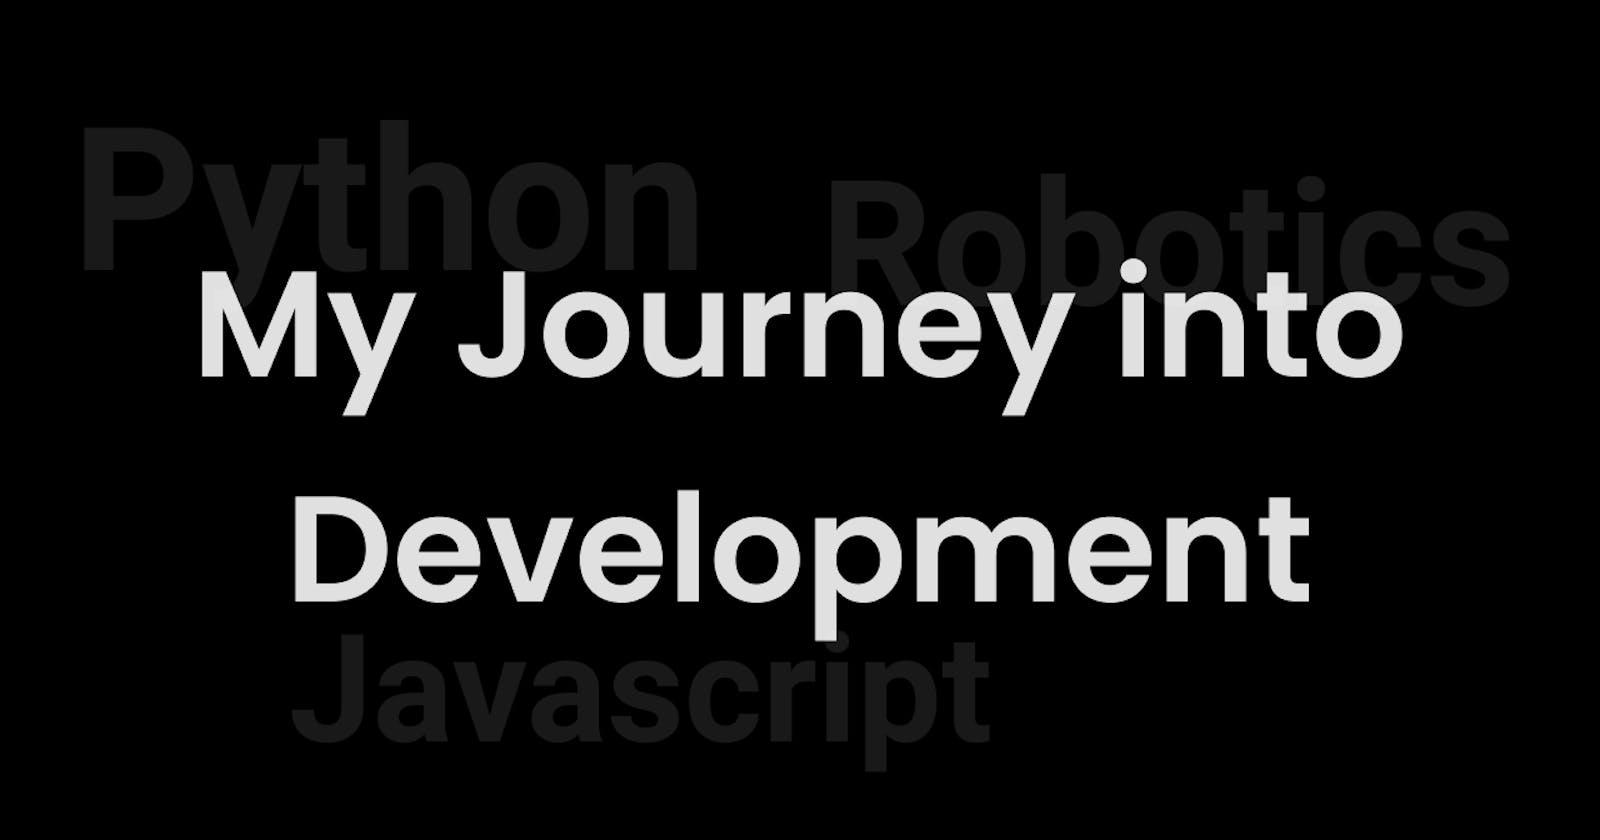 My Journey into Development